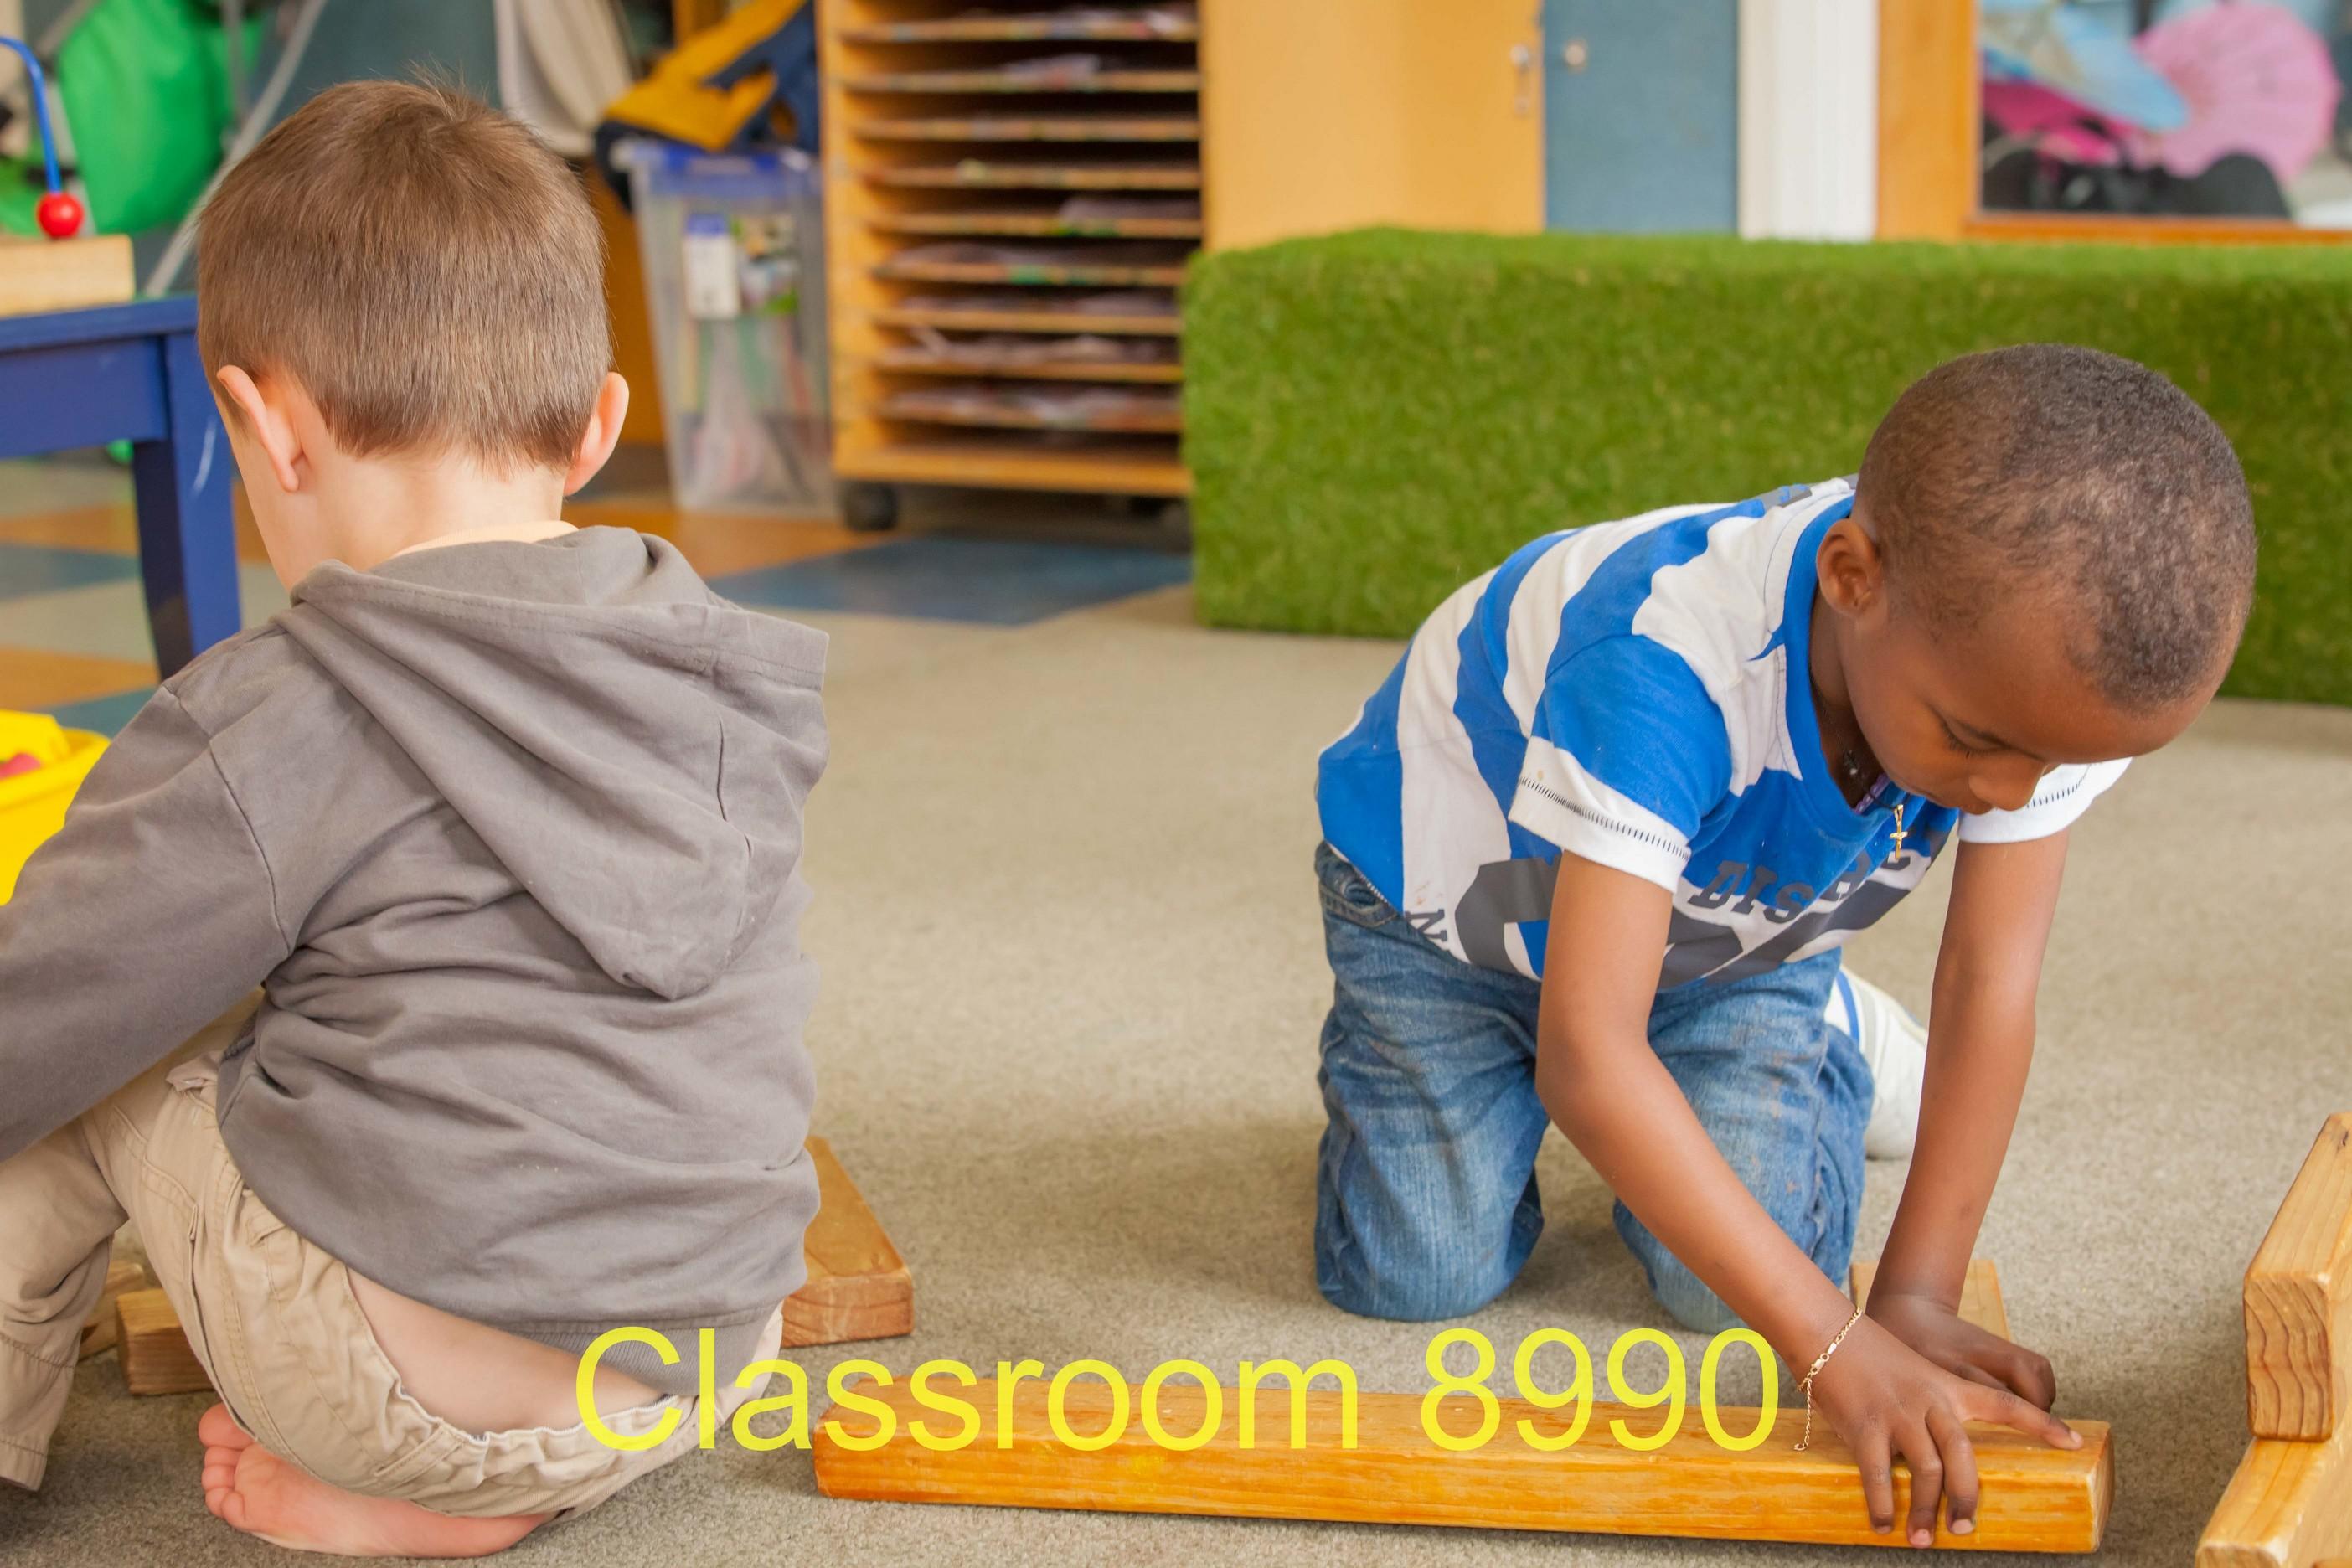 Classroom 8990